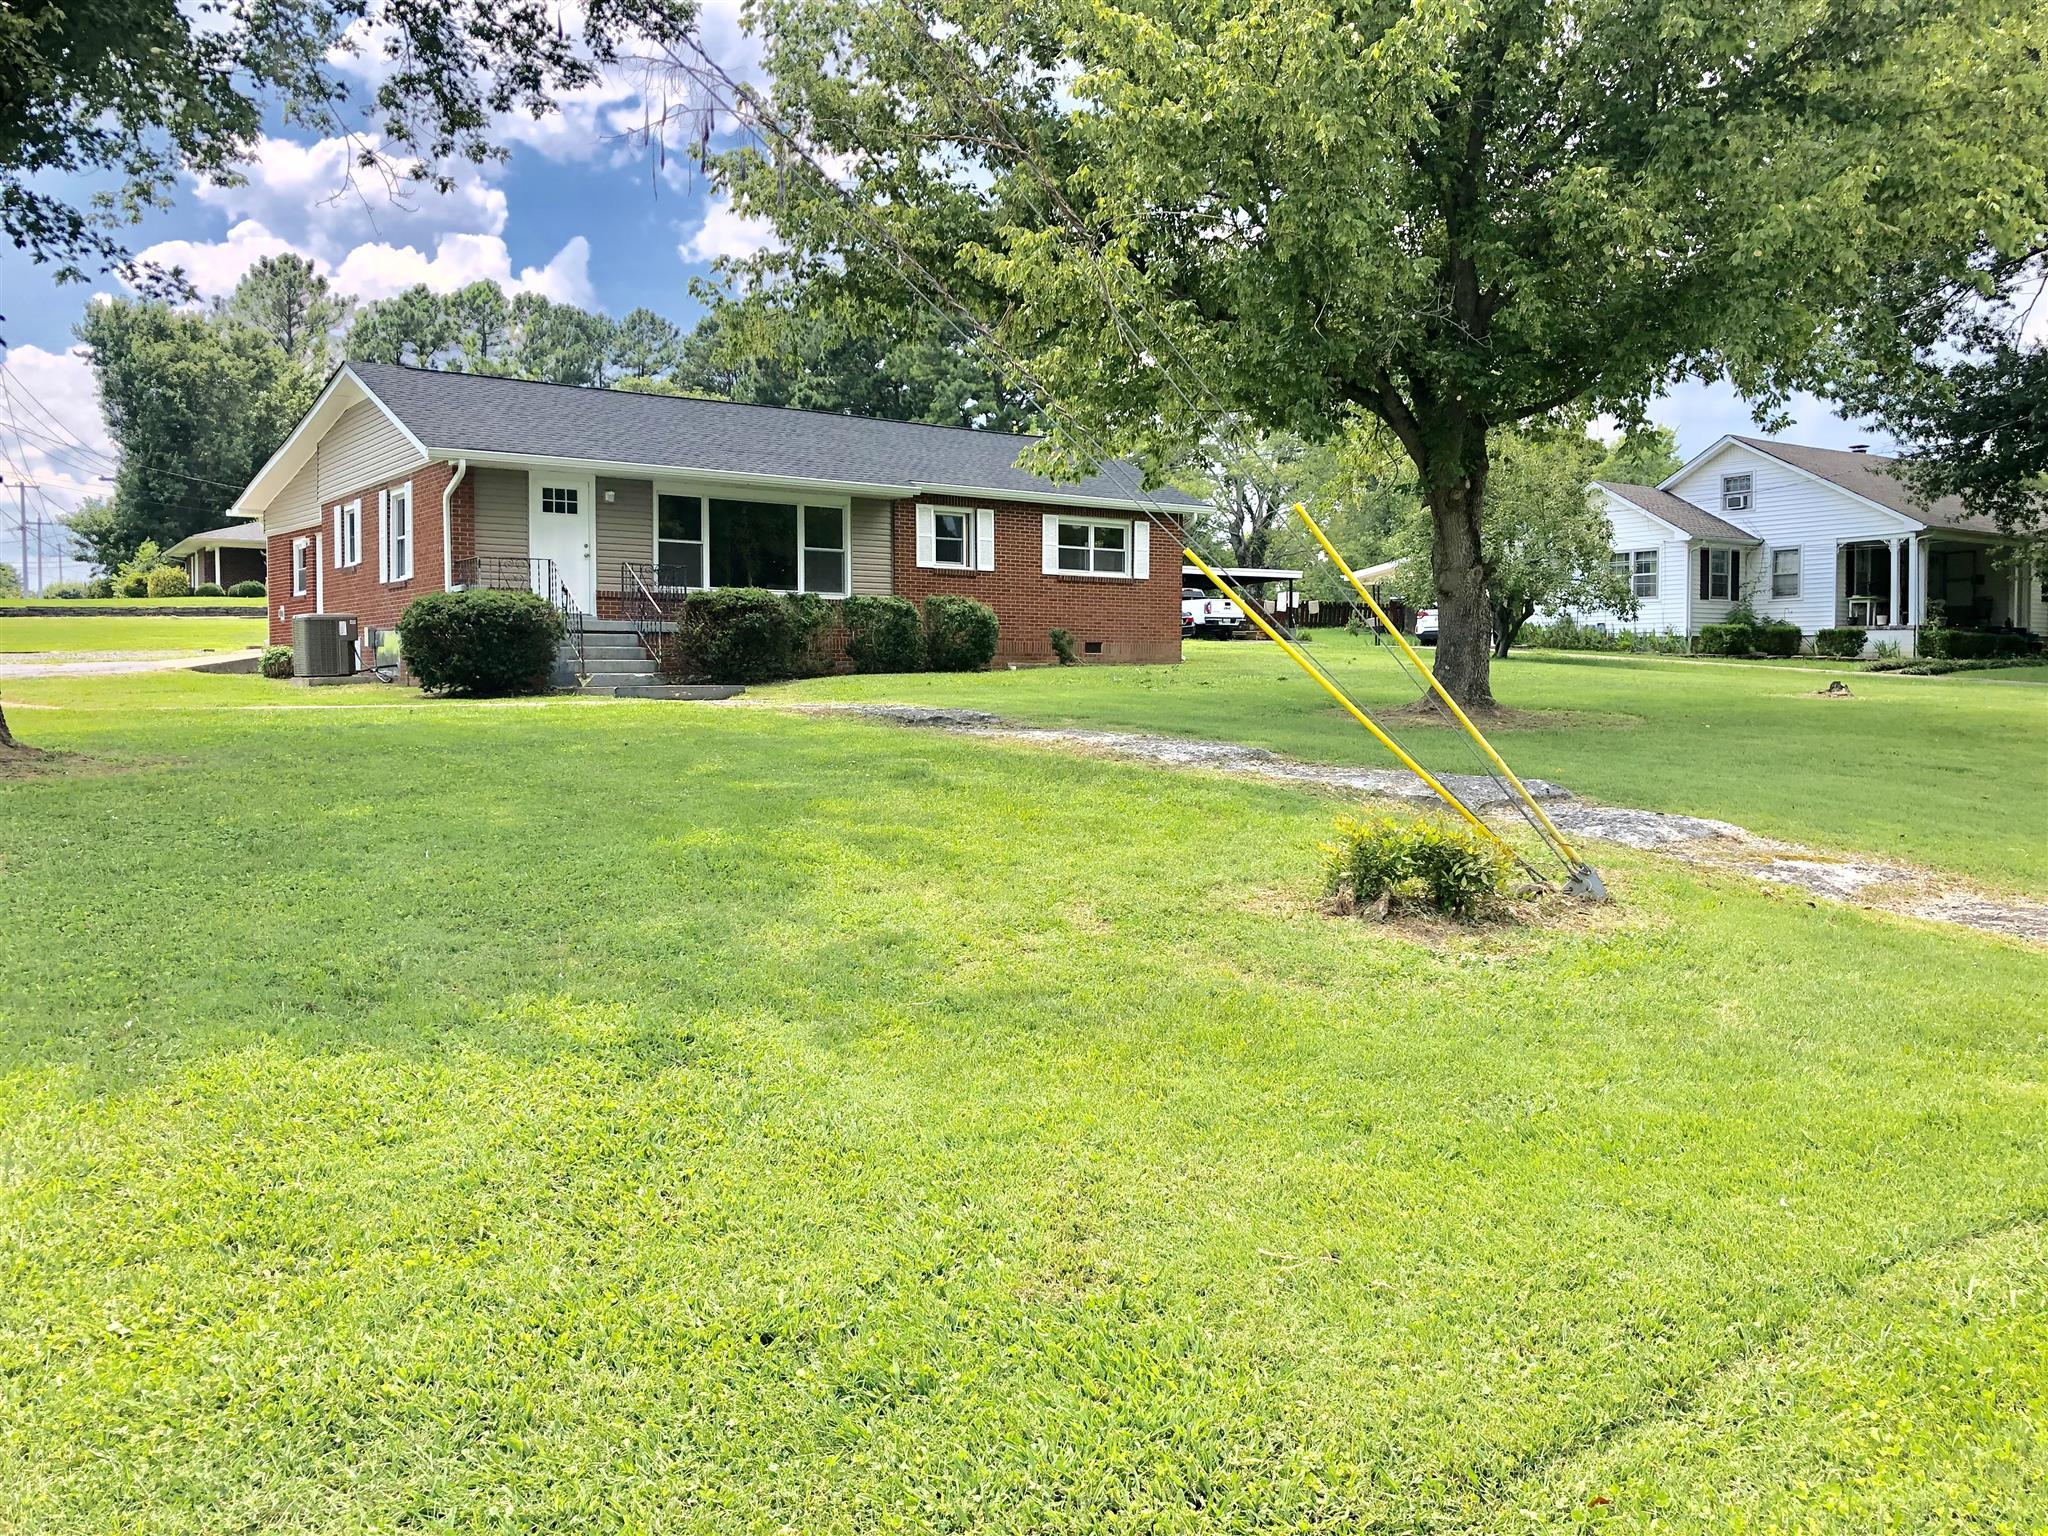 Belmont Hgts 2 Real Estate Listings Main Image